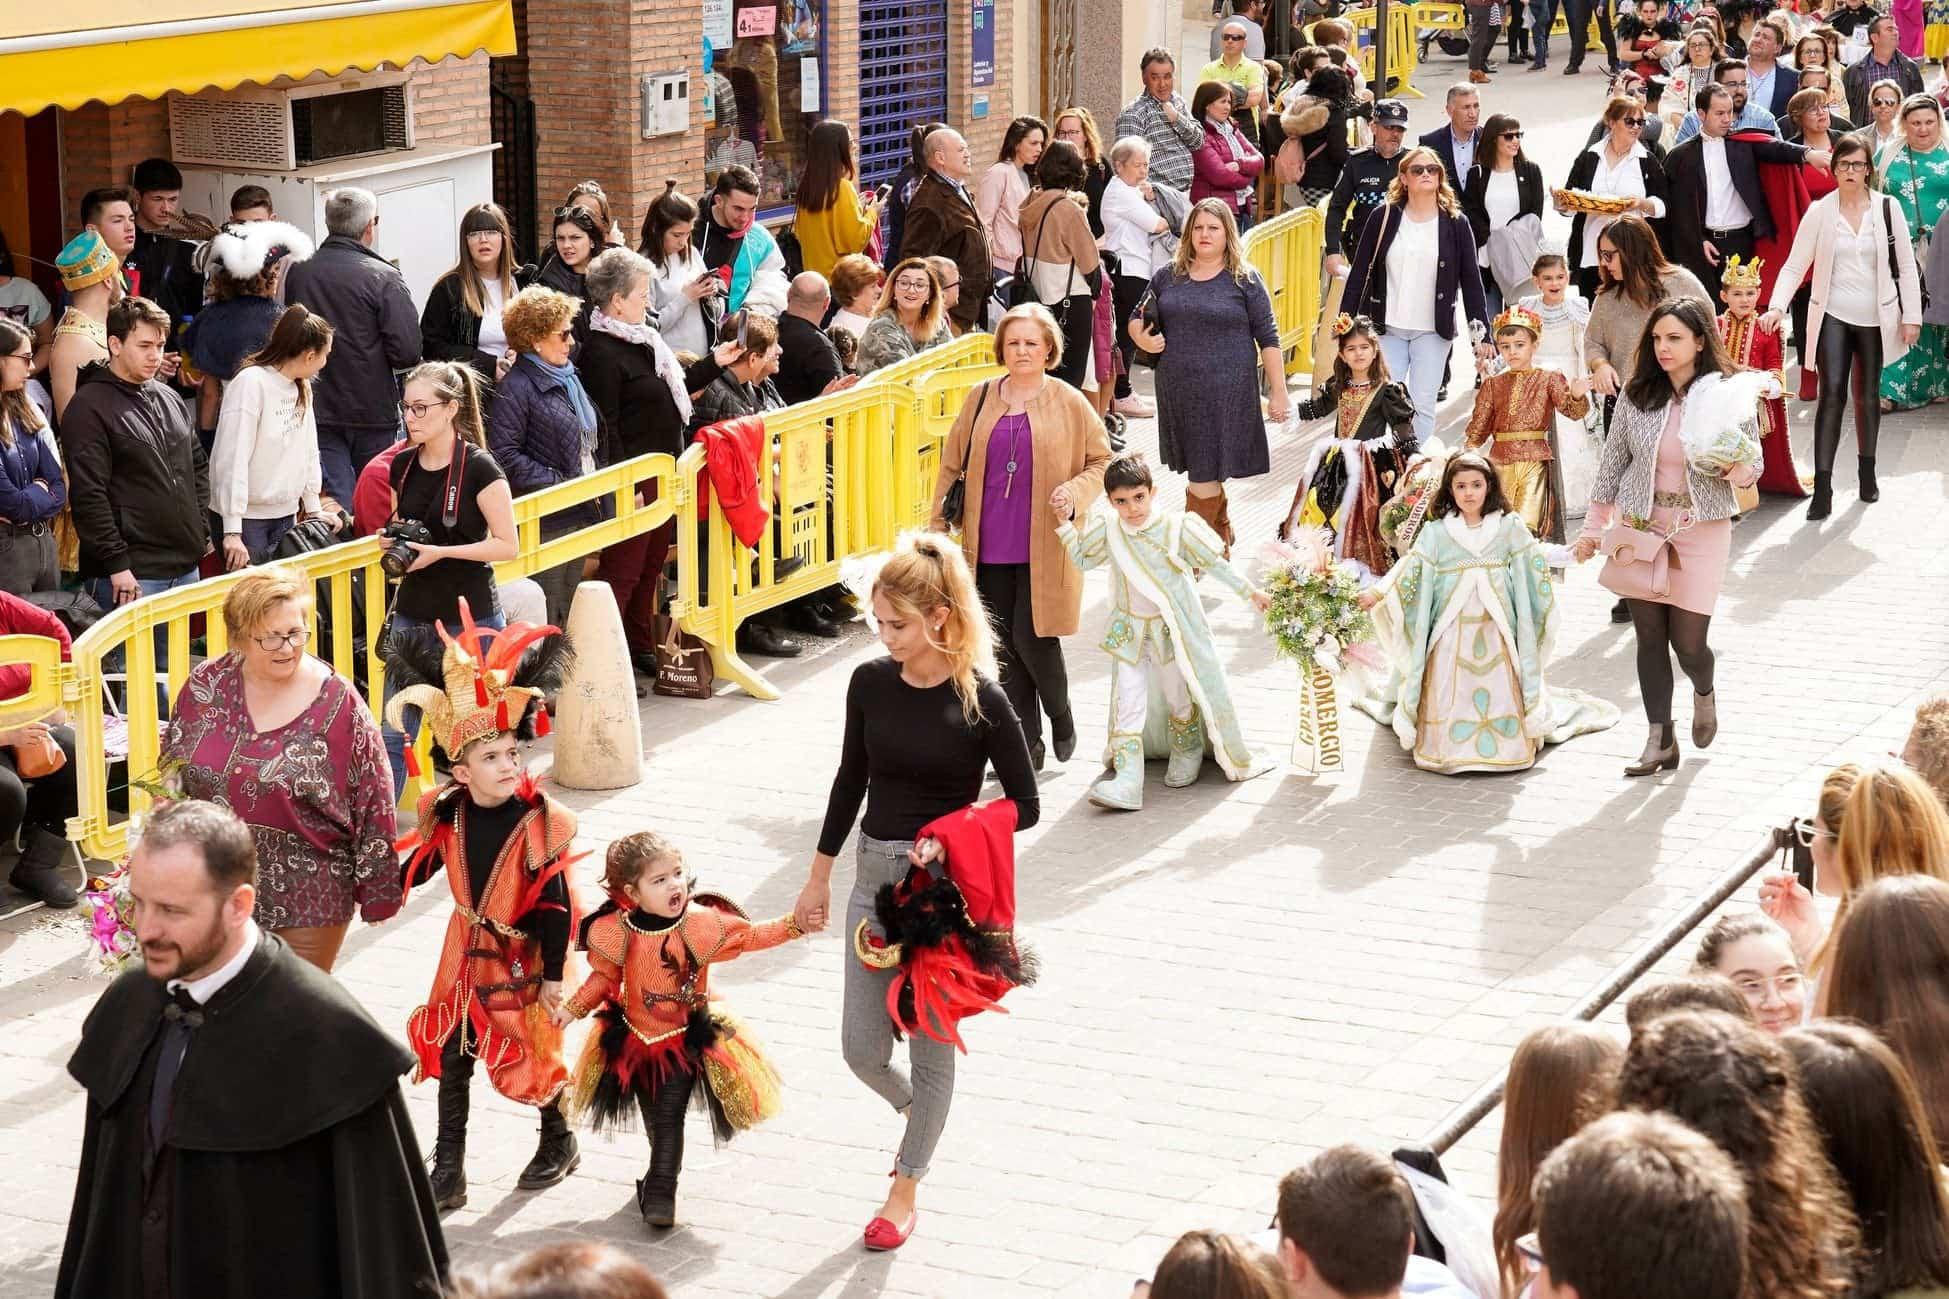 Carnaval de herencia 2020 ofertorio 148 - Selección de fotografías del Ofertorio del Carnaval de Herencia